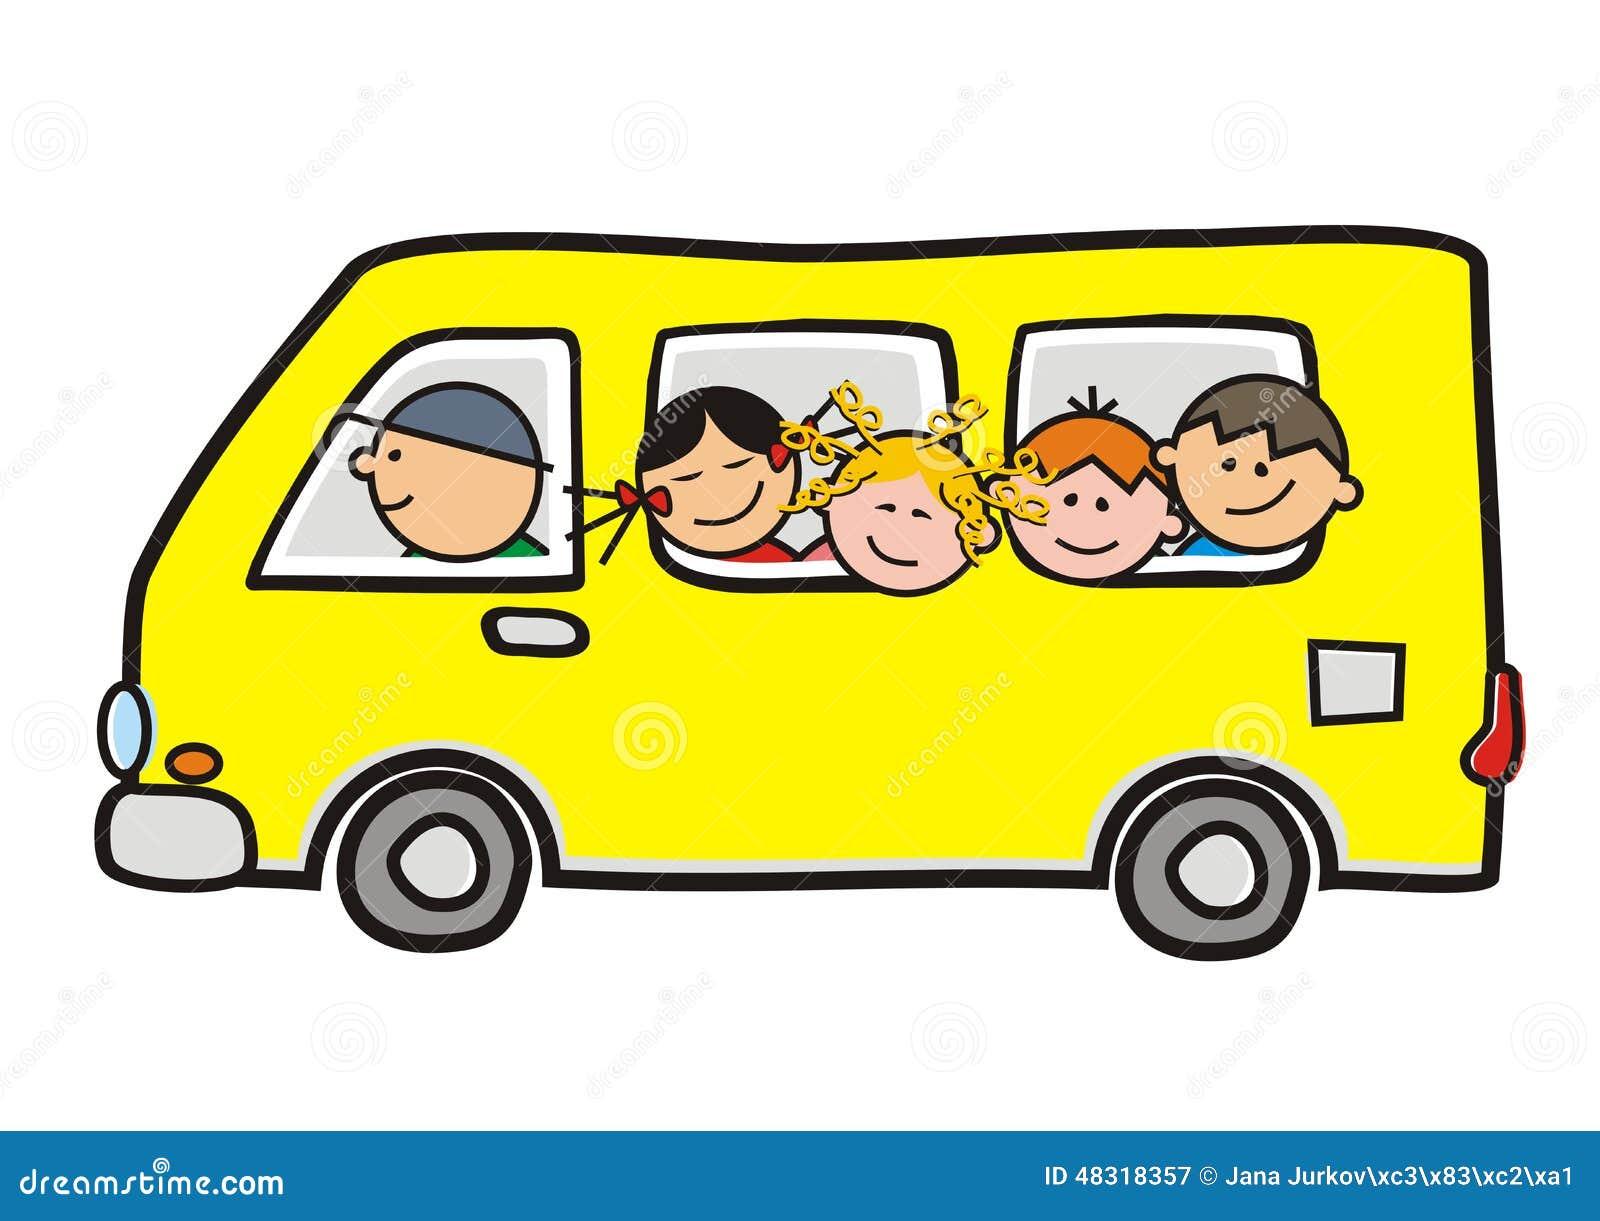 schulbus serie 1 vektor abbildung illustration von clip art of school bus driver laughing clip art of school bus stopping